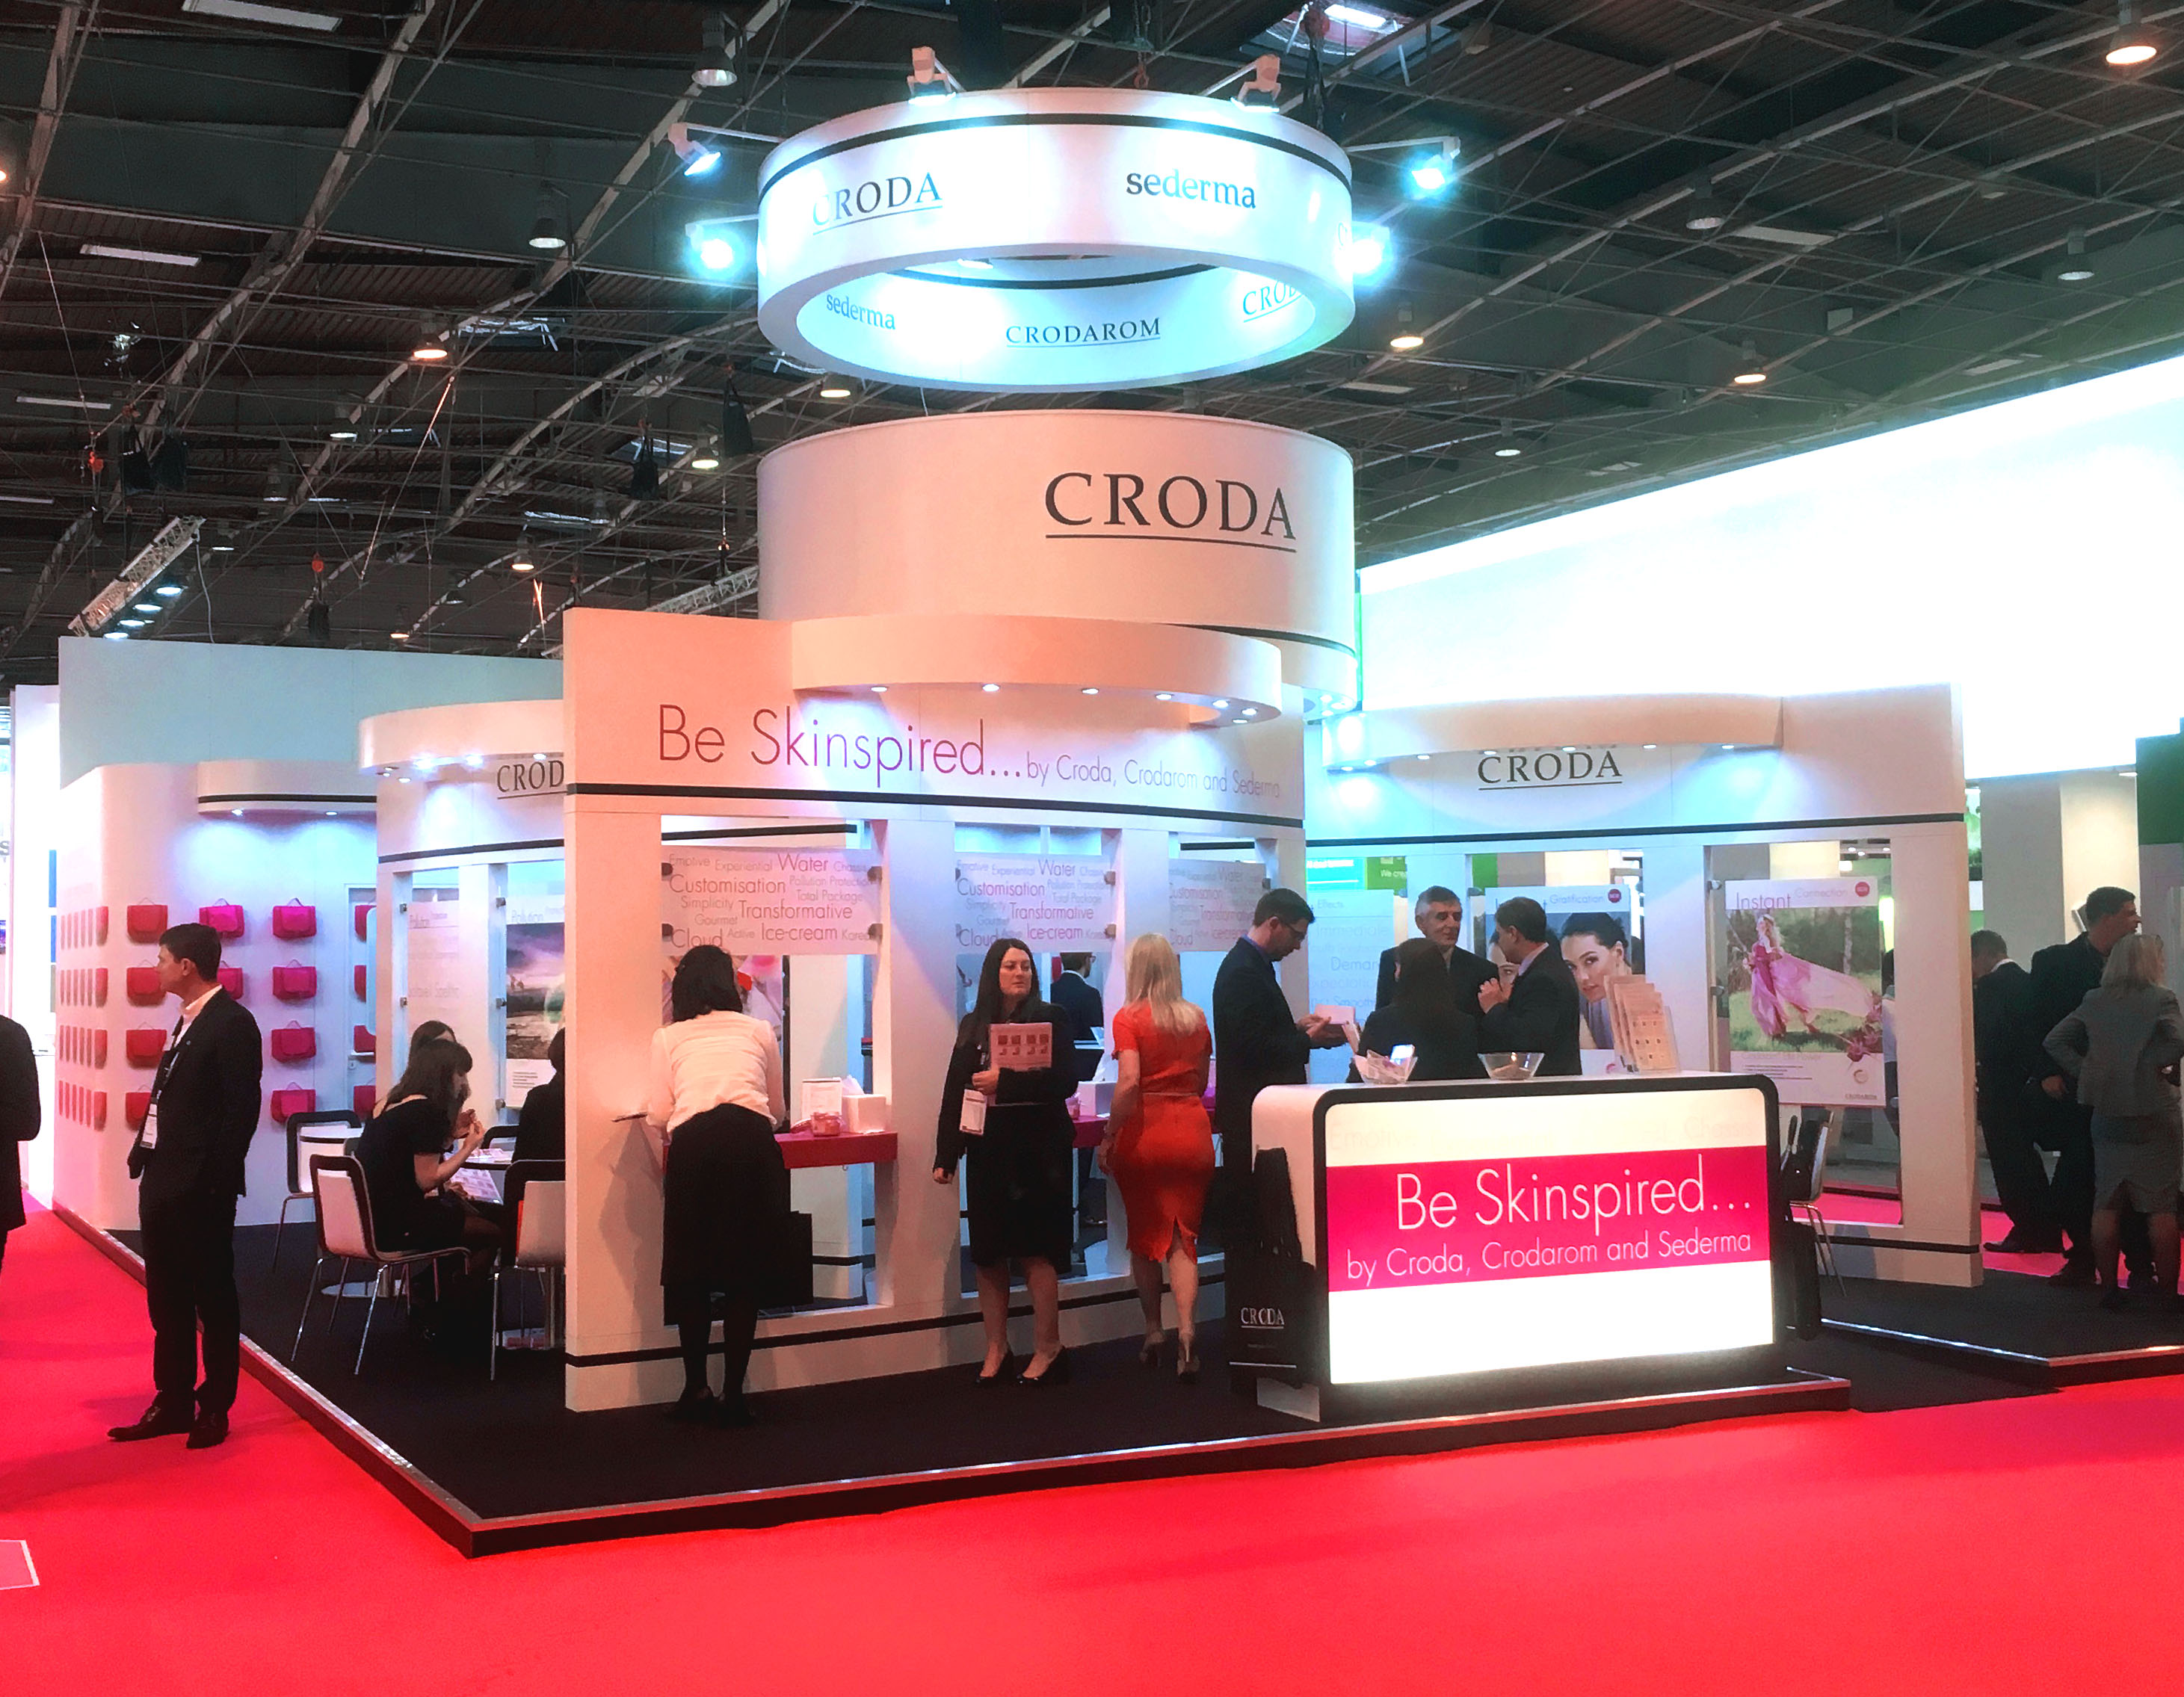 Exhibition Stand Design Site : Croda europe exhibition stand dawson design